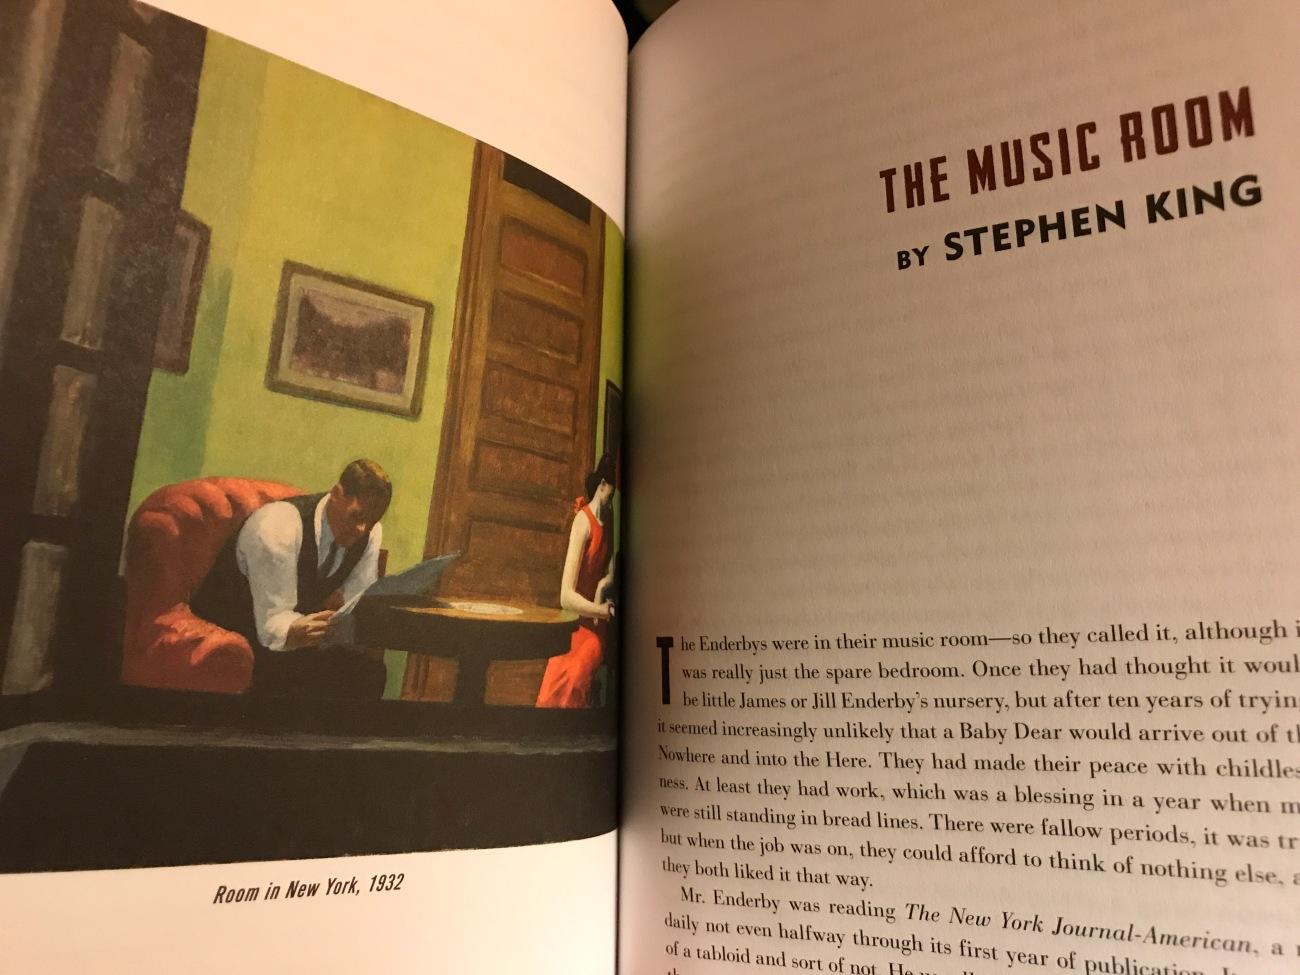 Stephen King's The Music Room (WildmooBooks.com)